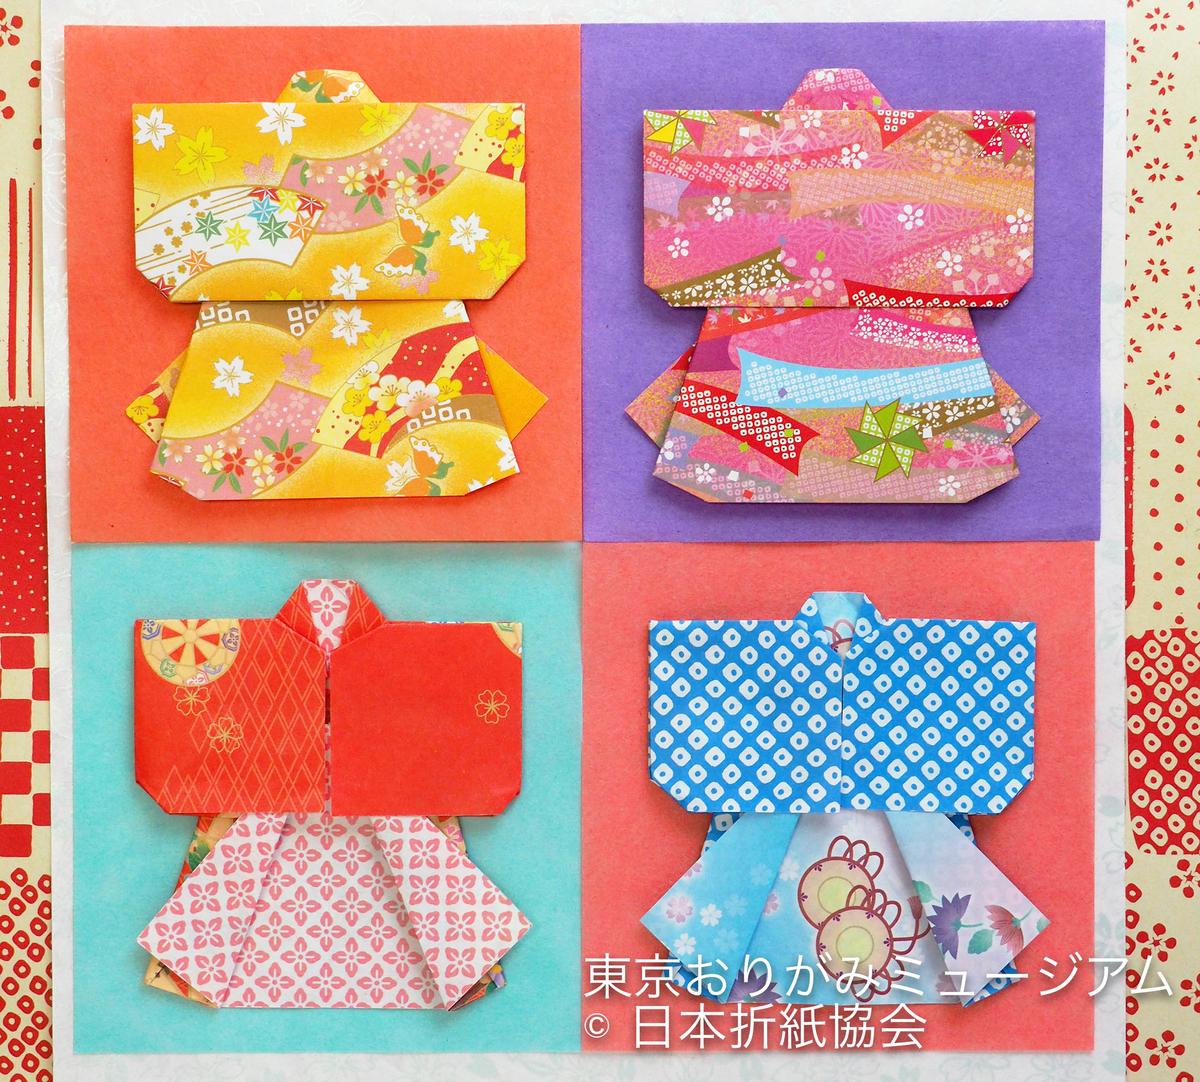 f:id:origami-noa:20200107182351j:plain